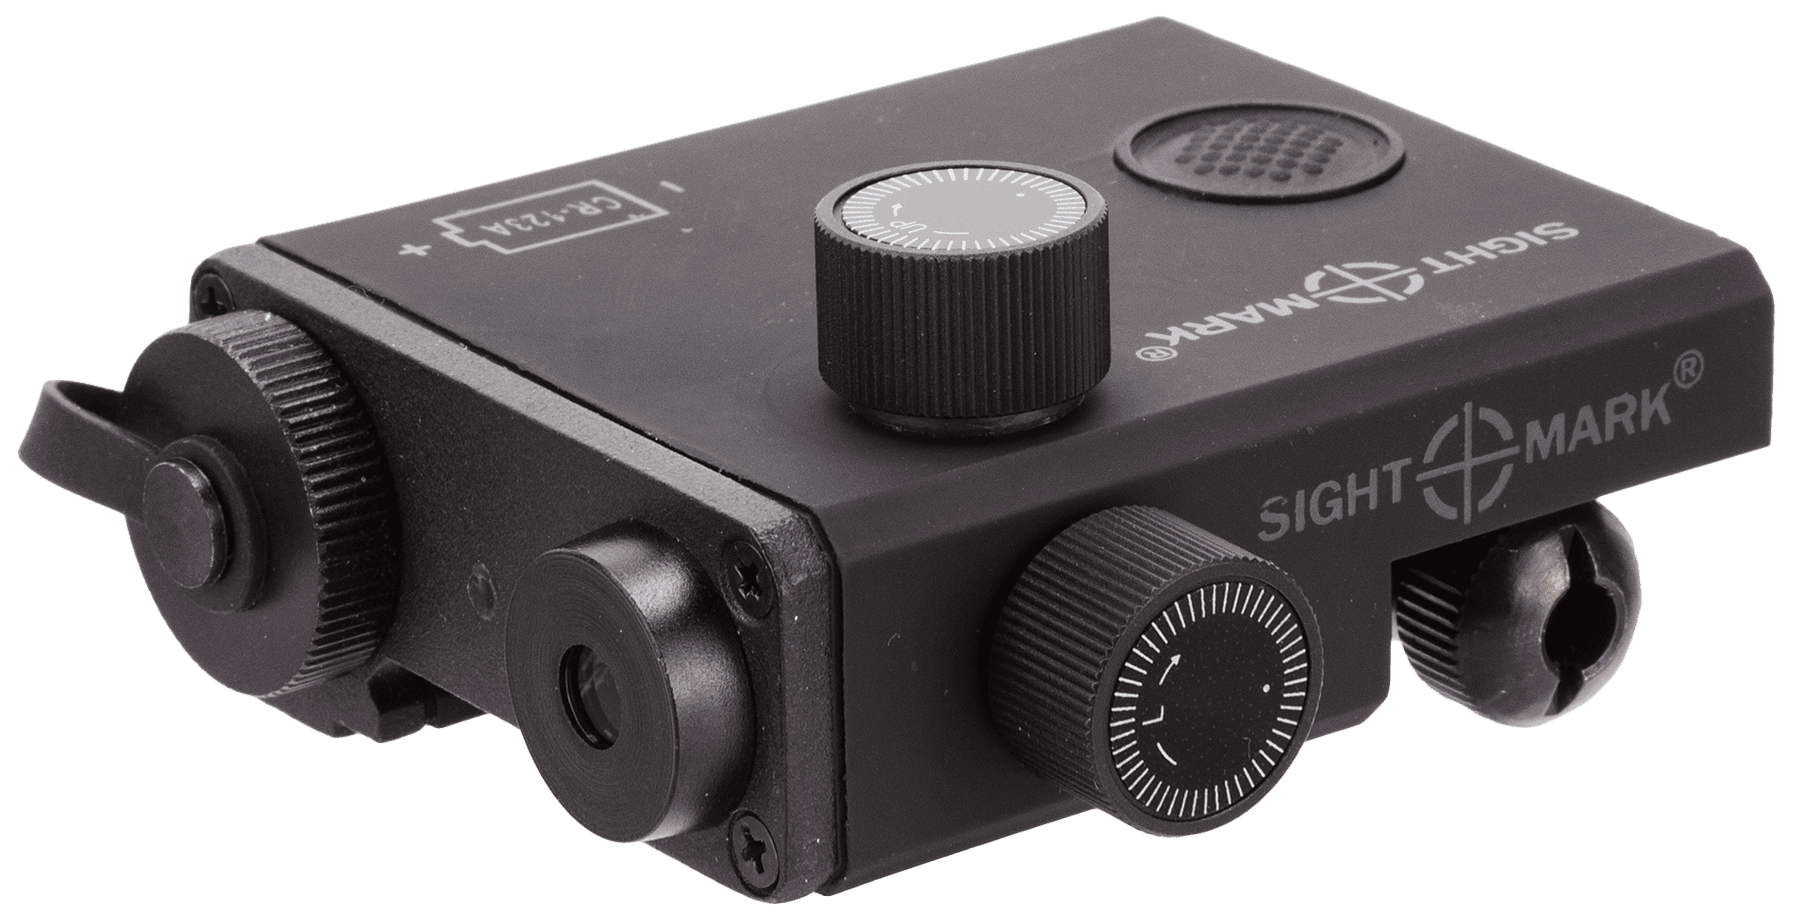 Sightmark LoPro Green Laser CR123A Battery Picatinny Mount